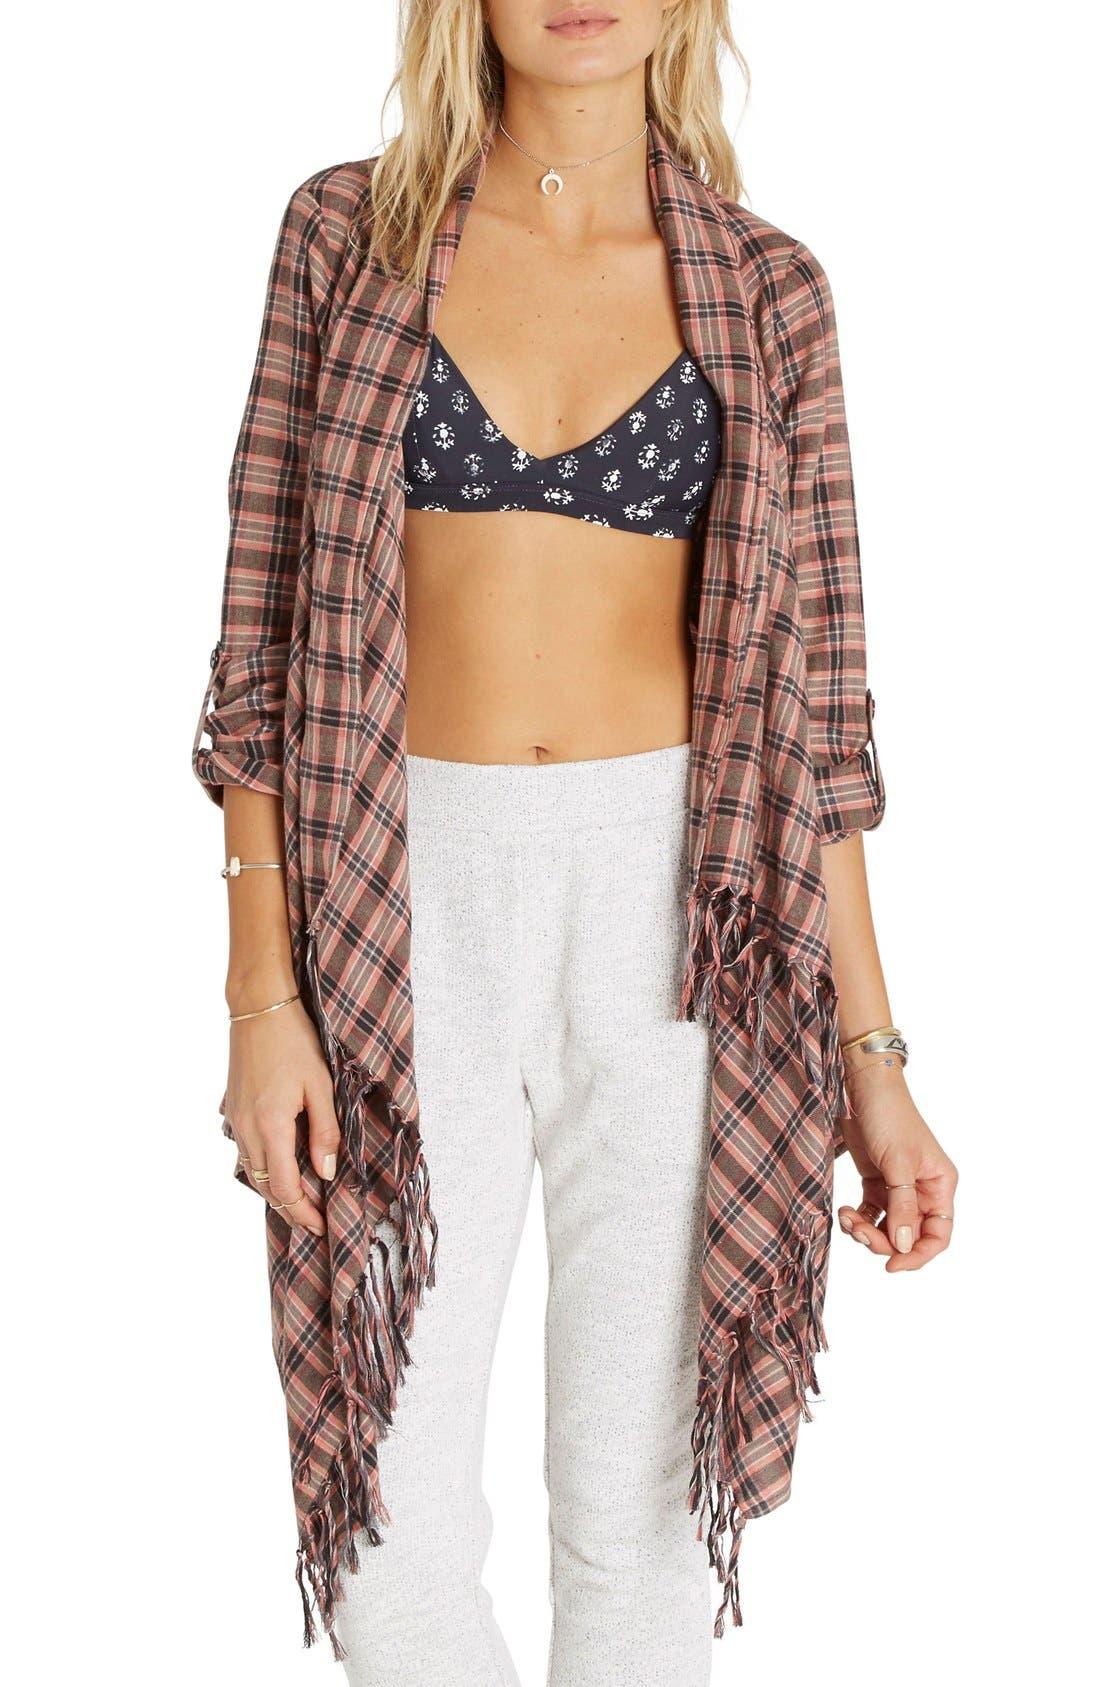 Alternate Image 1 Selected - Billabong 'Liv It Up' Open Flannel Cardigan